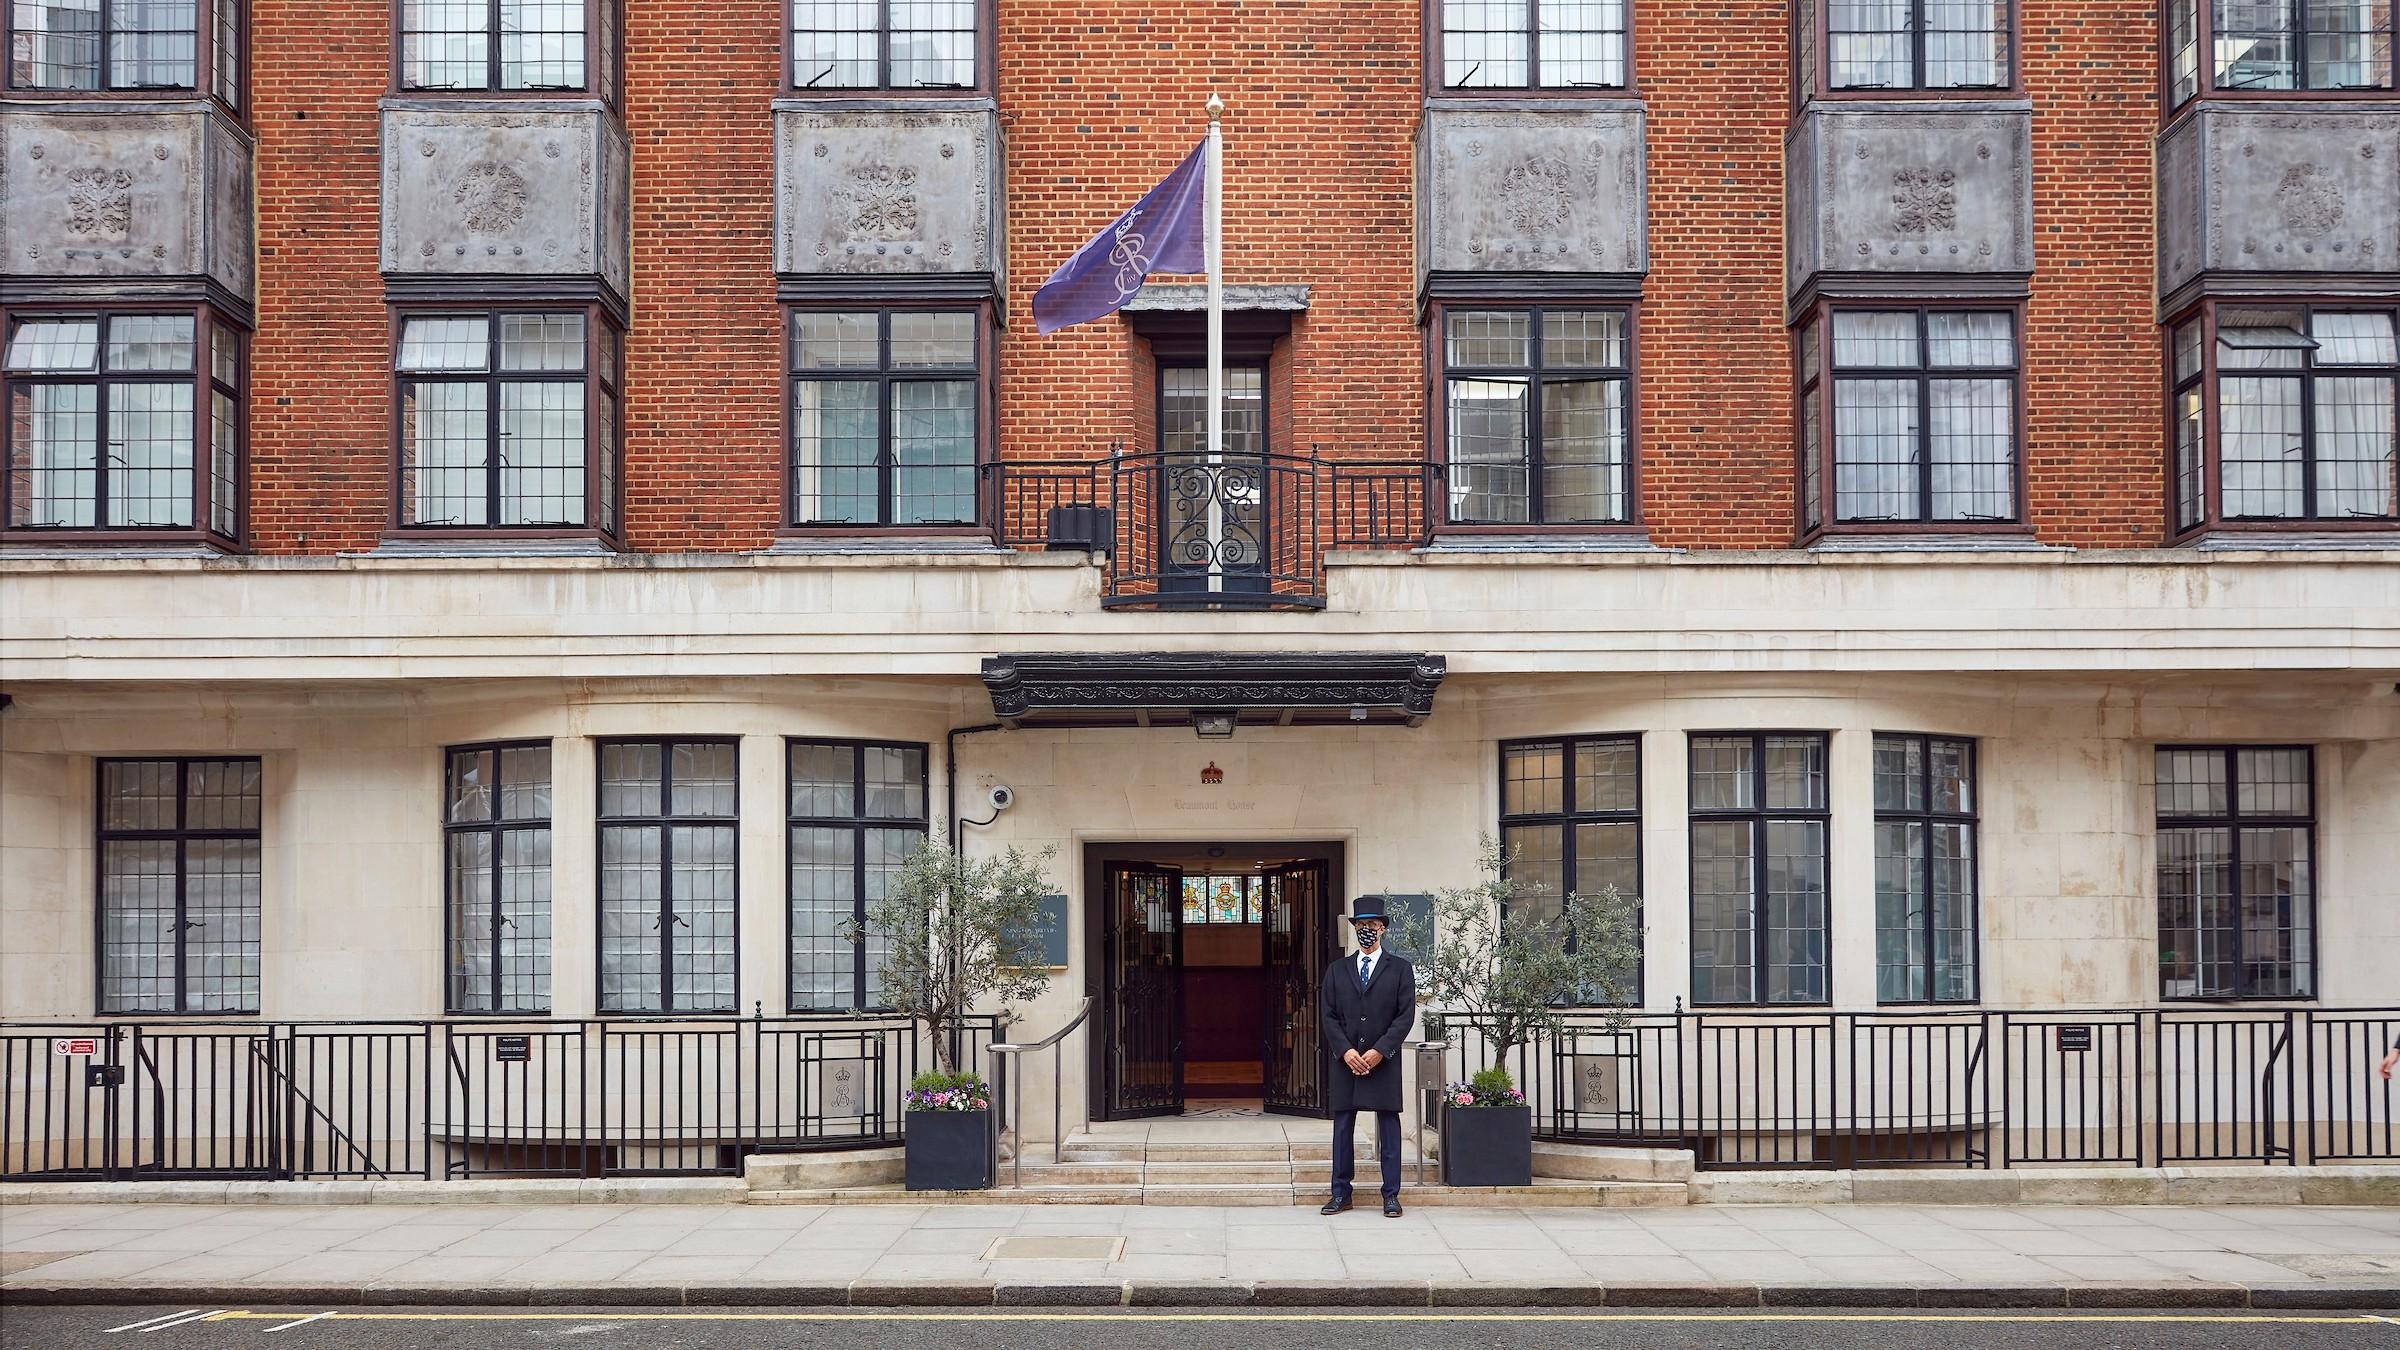 King Edward VII's Hospital veterans' grant open for applications